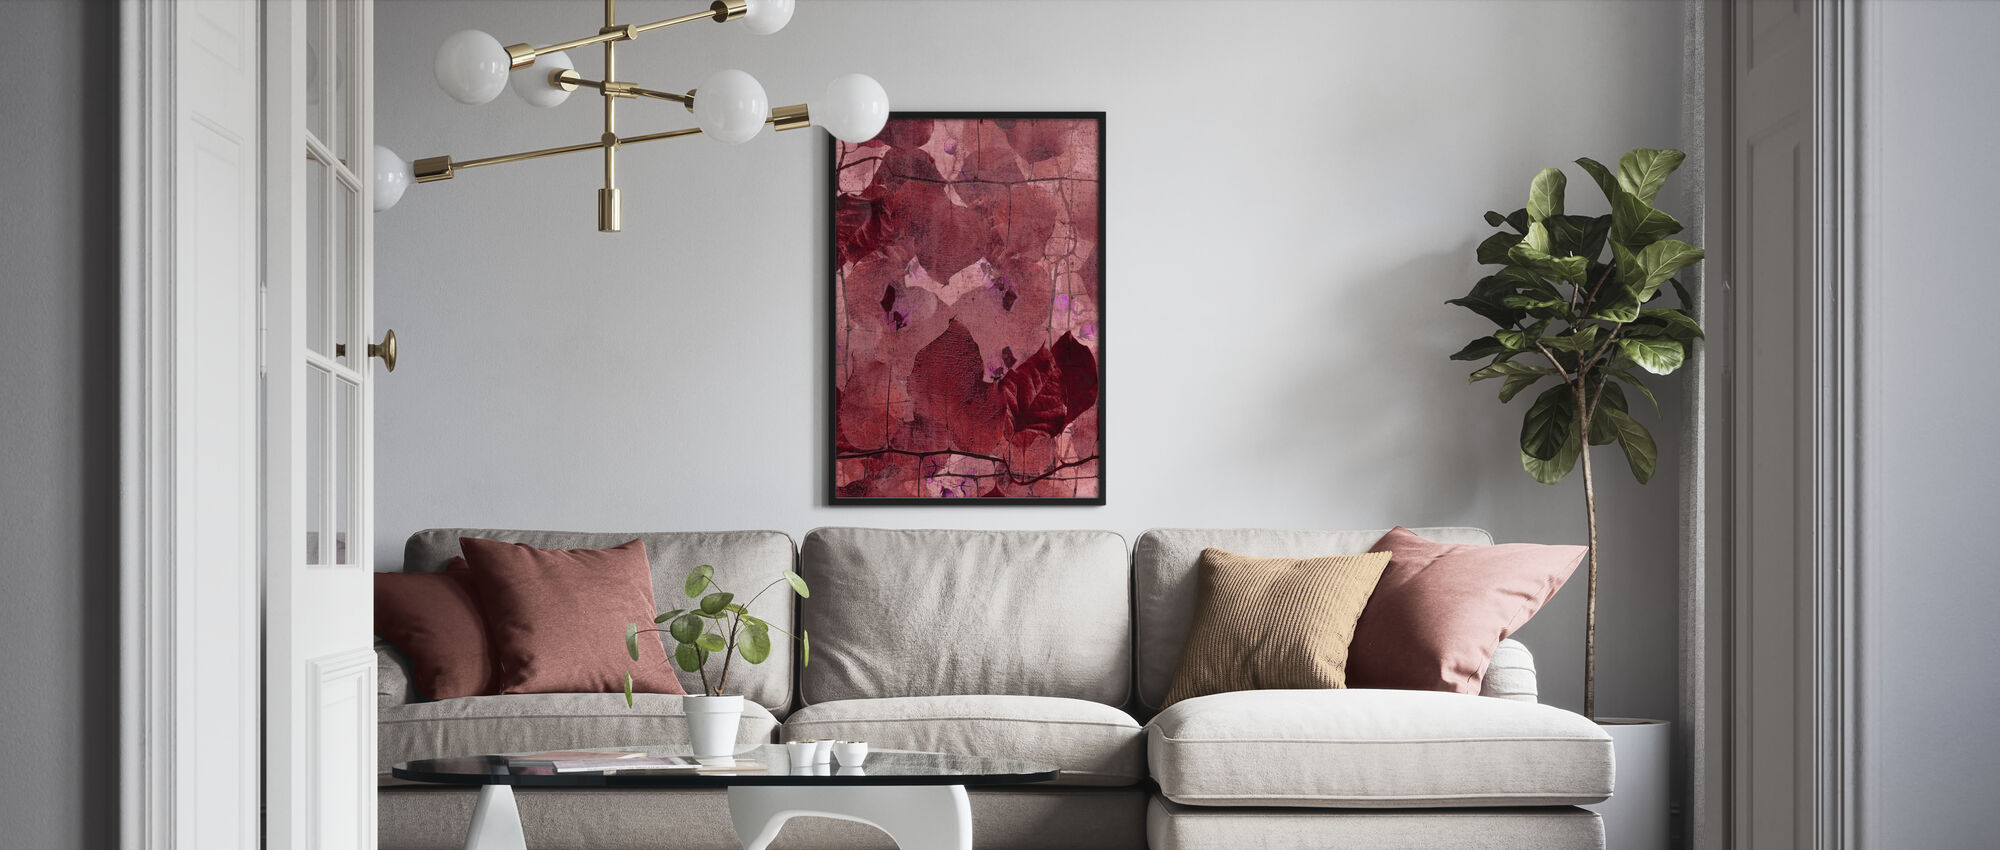 Bordeaux Grapevine - Poster - Living Room